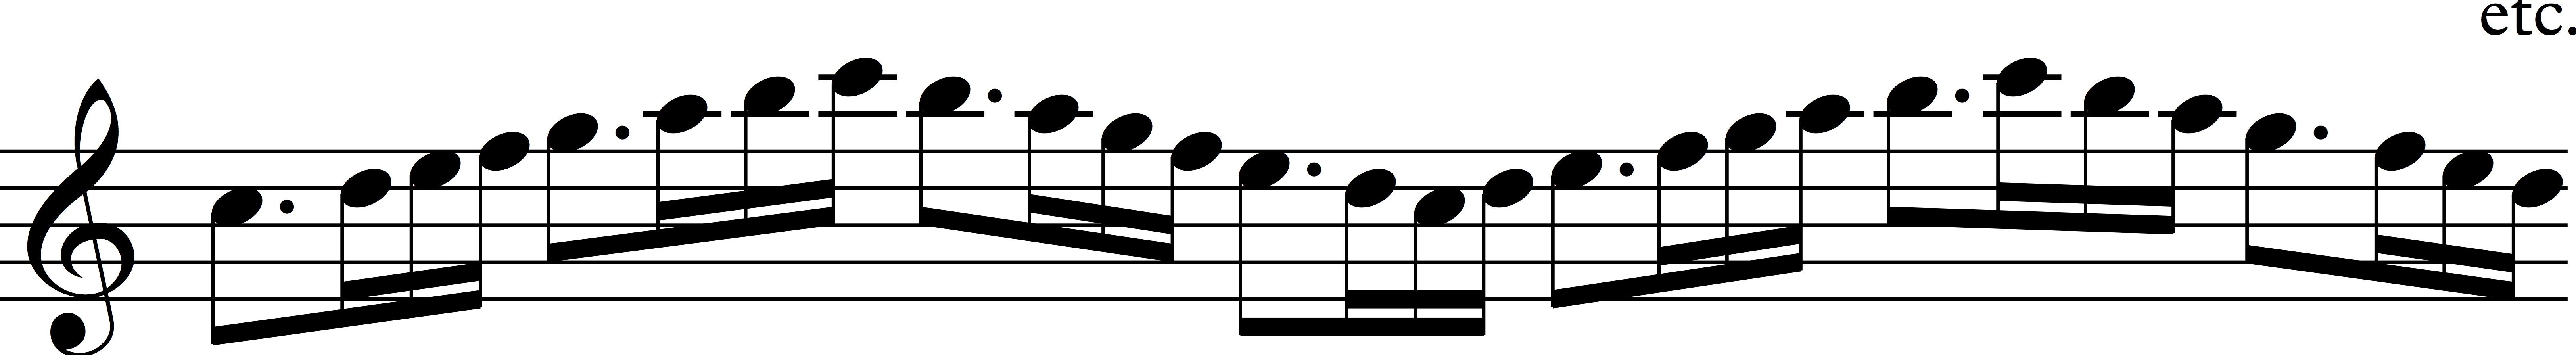 Scale 3 rhtyhm 3b.jpg